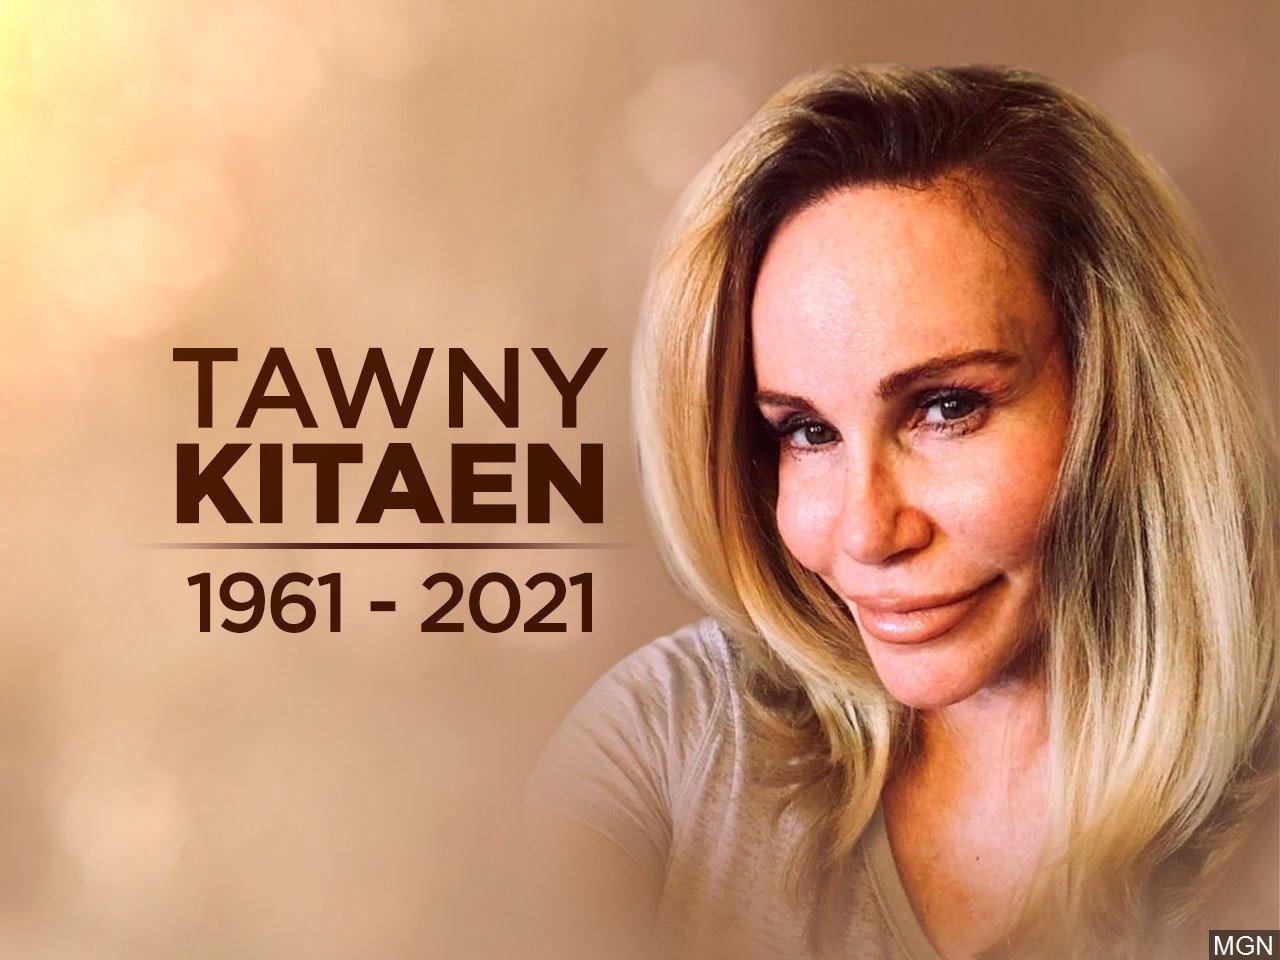 Tawny Kitaen, star of '80s rock music videos, dies at 59 - WBBJ TV